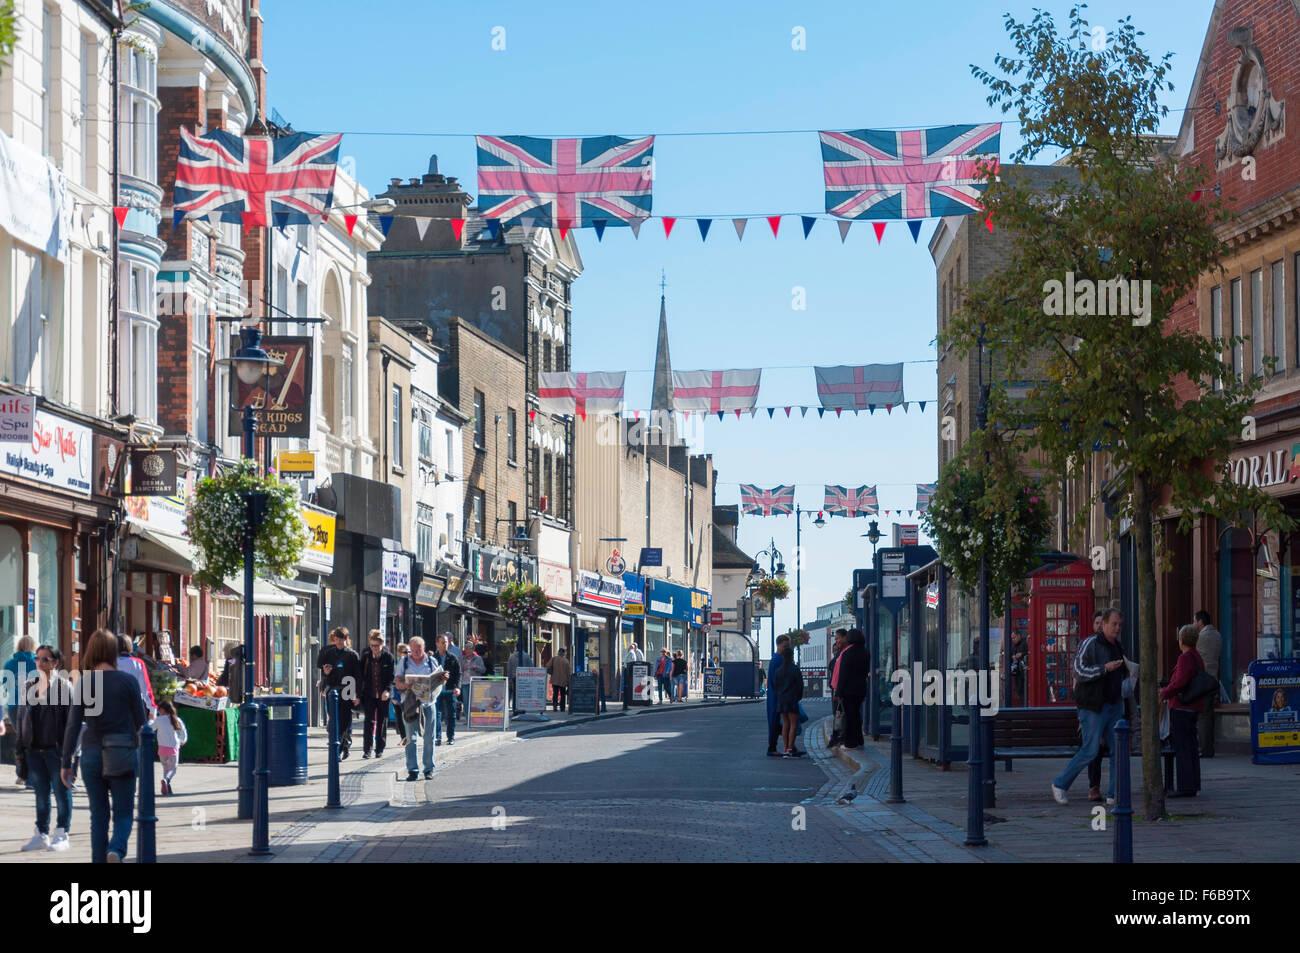 Pedestrianised King Street, Gravesend, Kent, England, United Kingdom - Stock Image